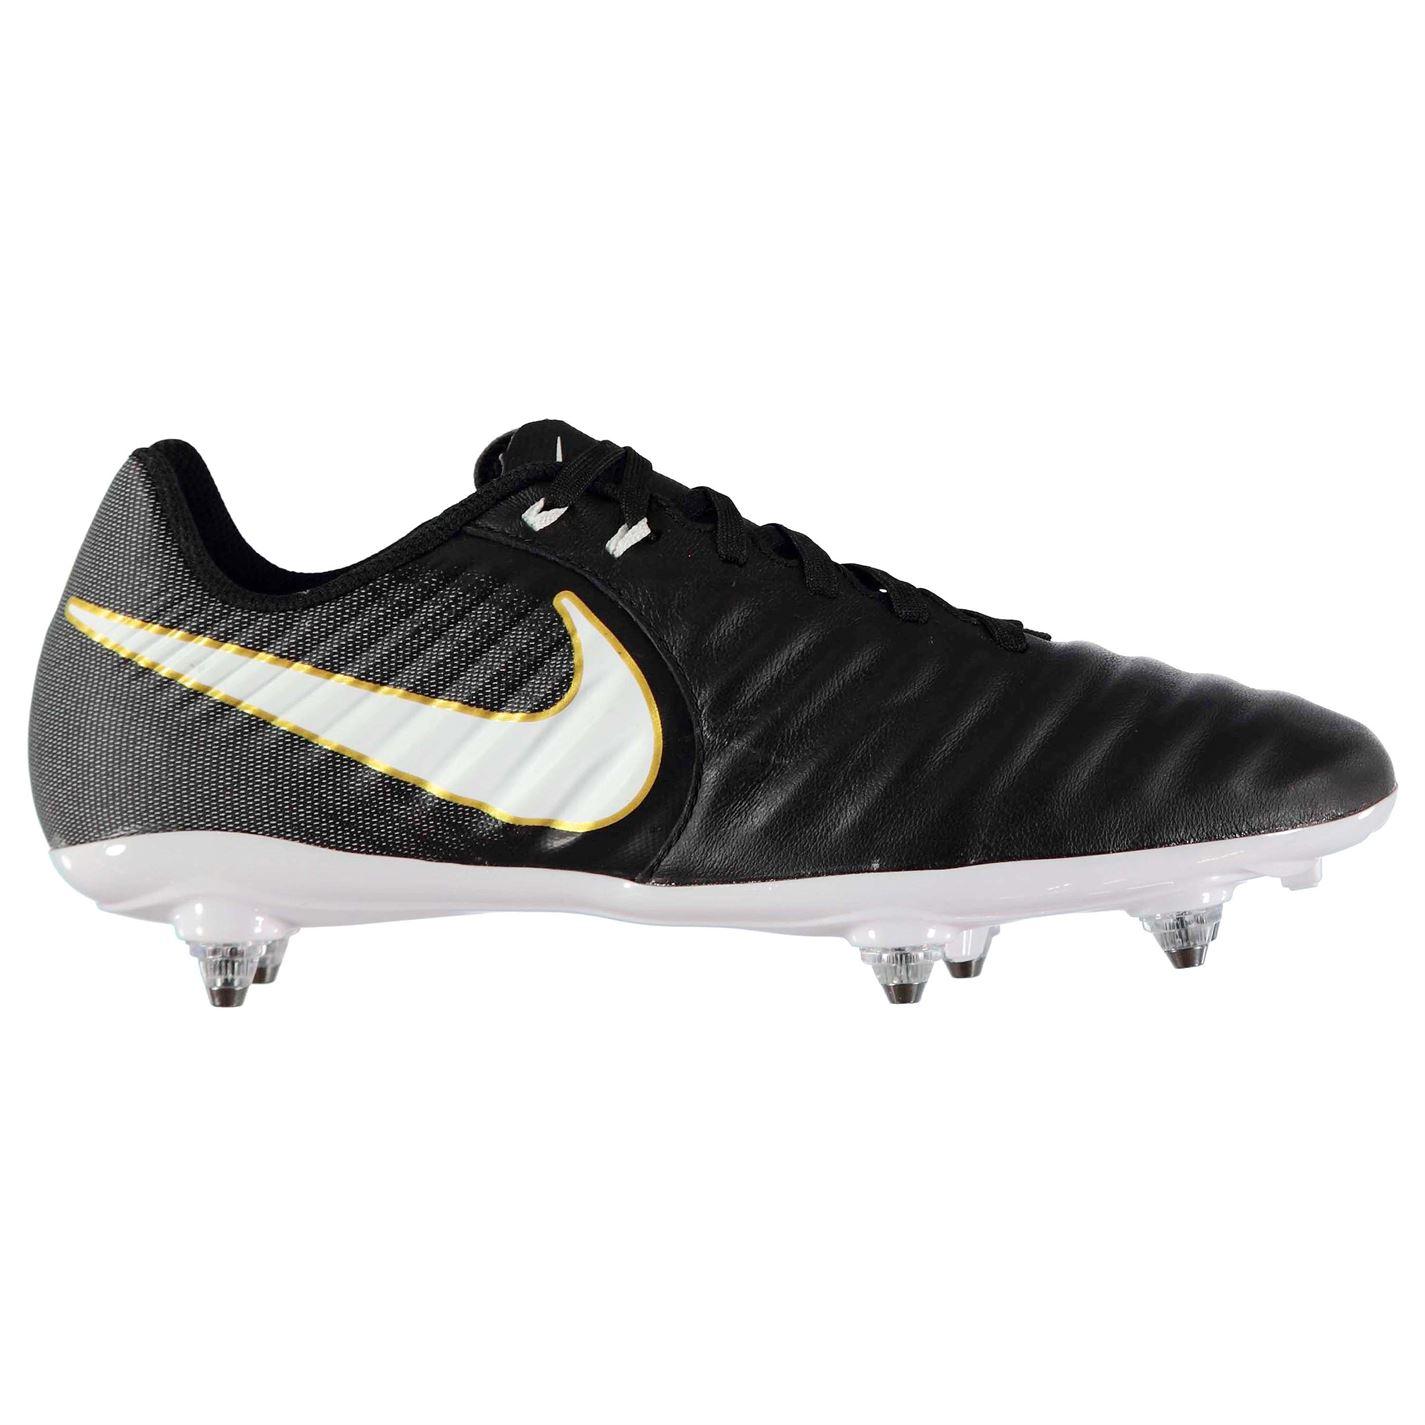 Nike Tiempo Ligera SG Football Boots Mens